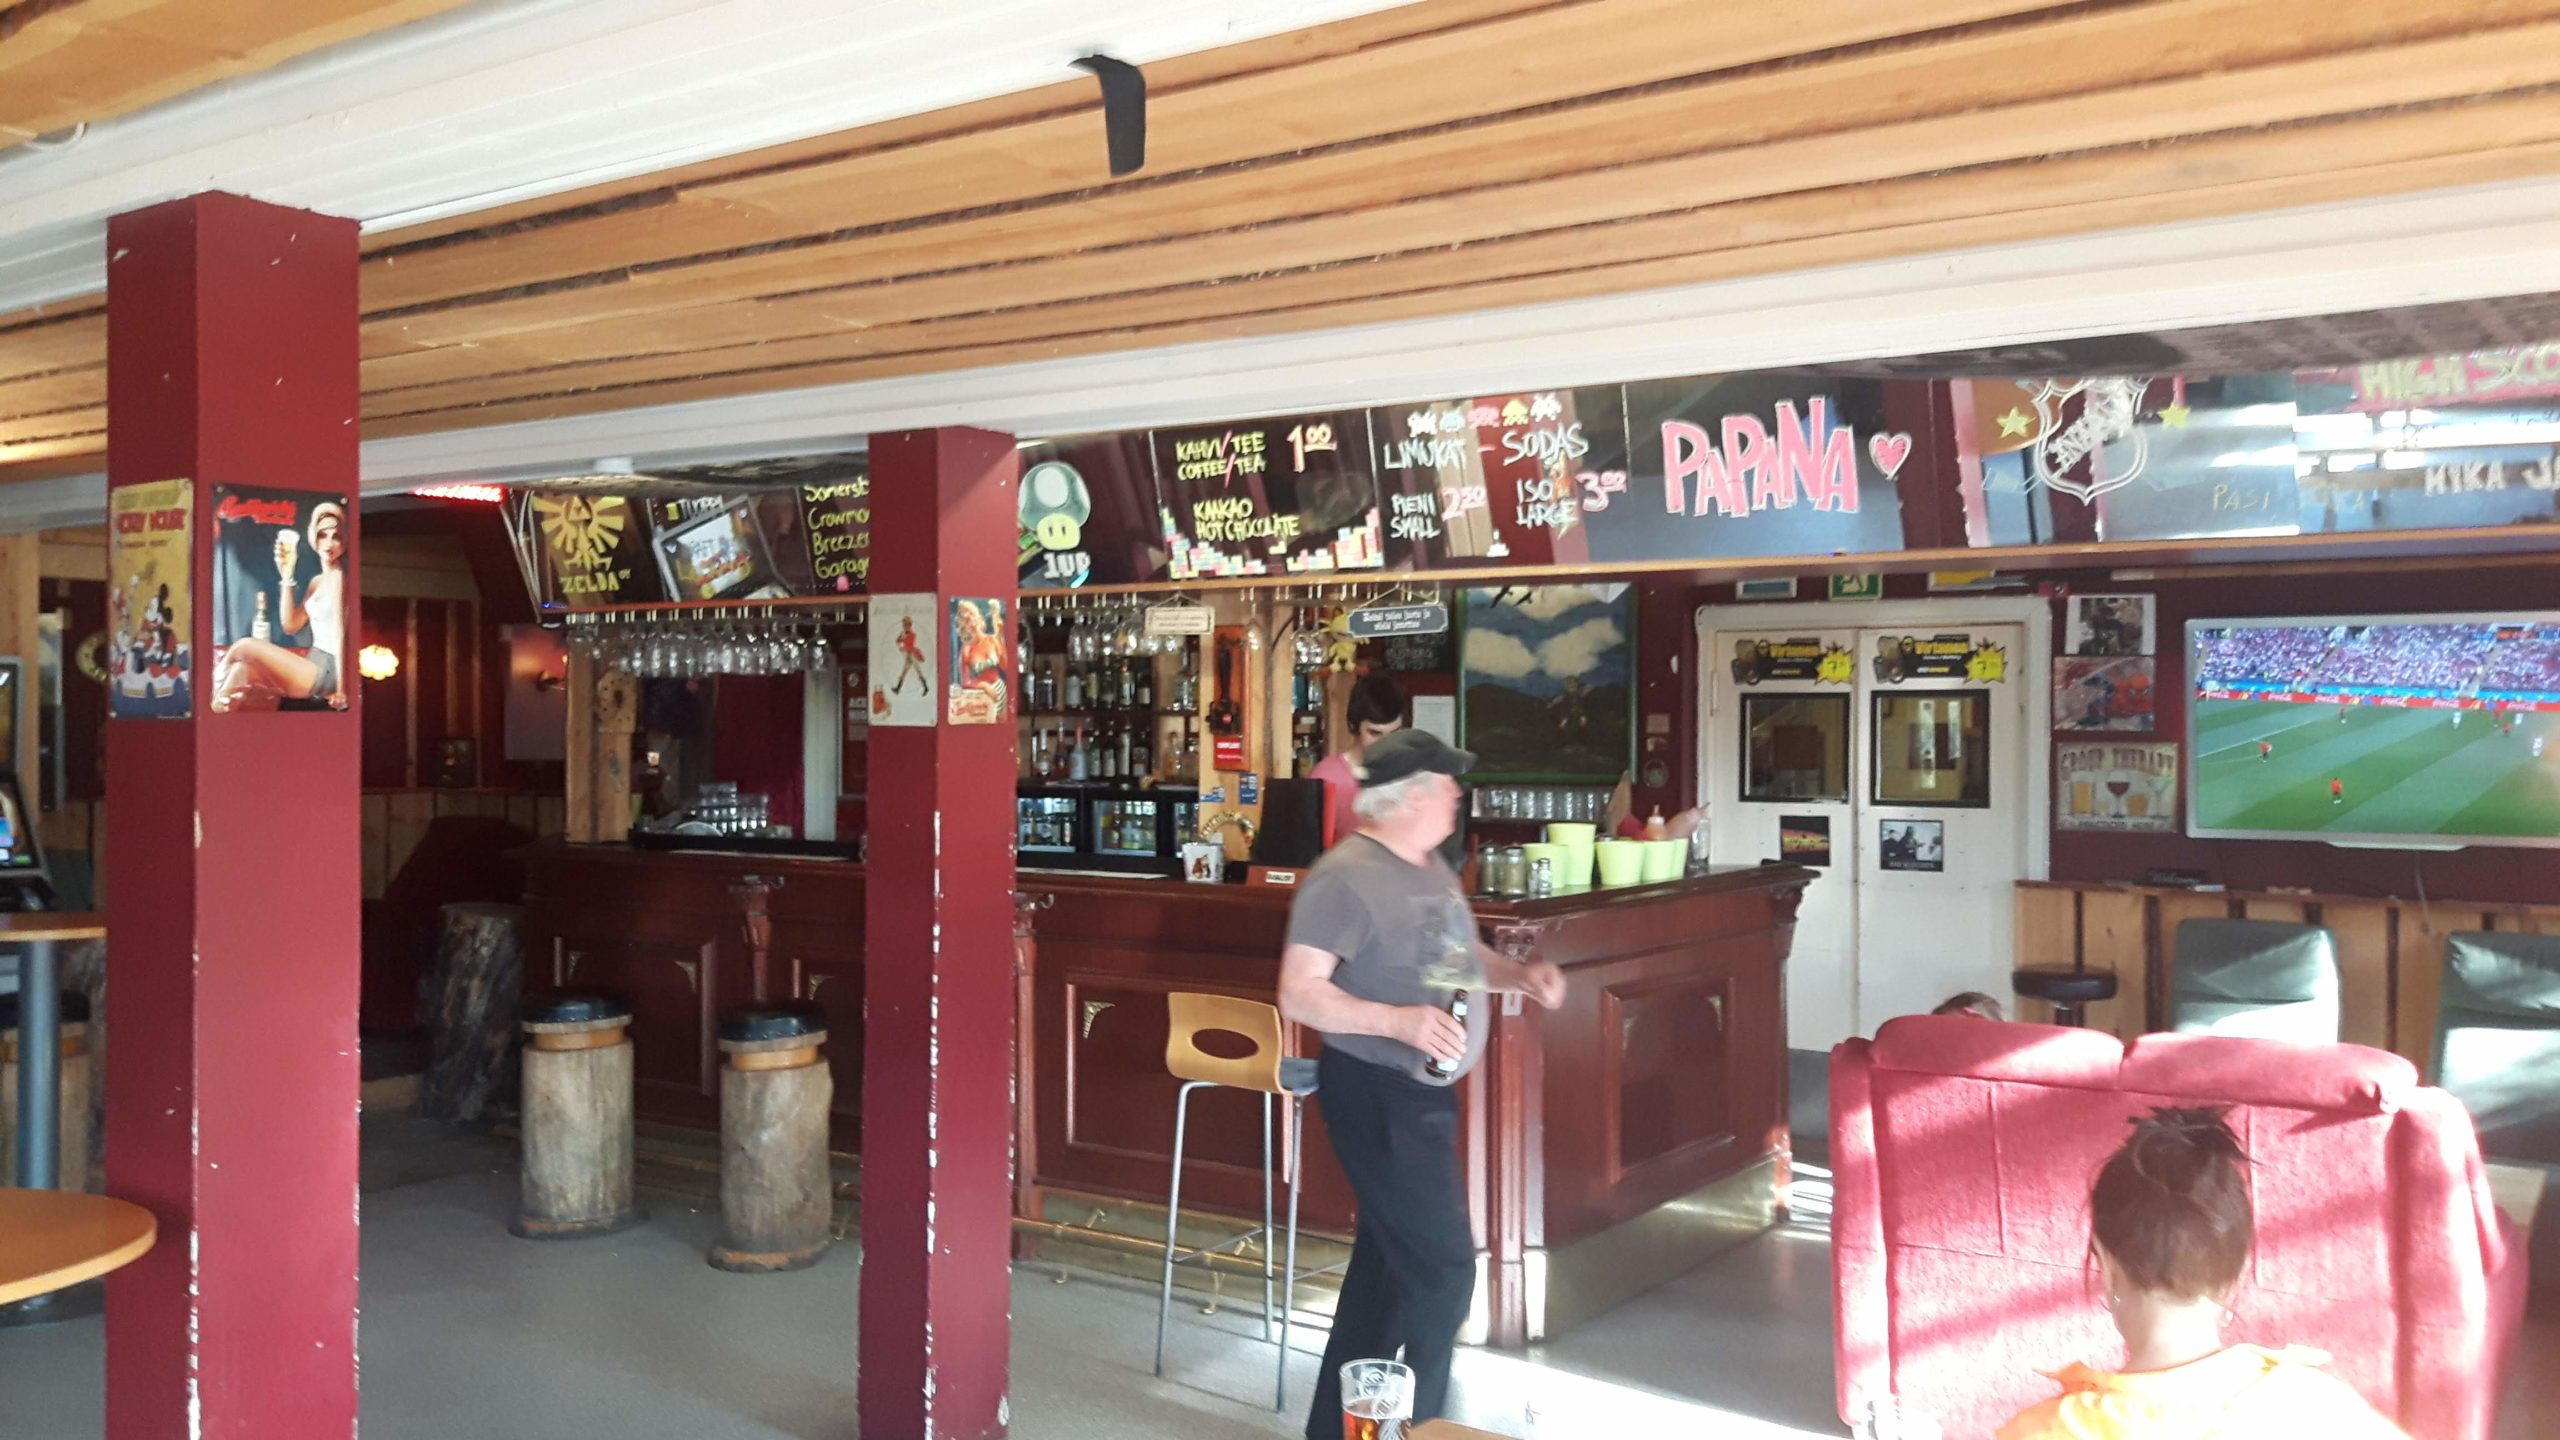 PaPaNa Pub Inari, Finland